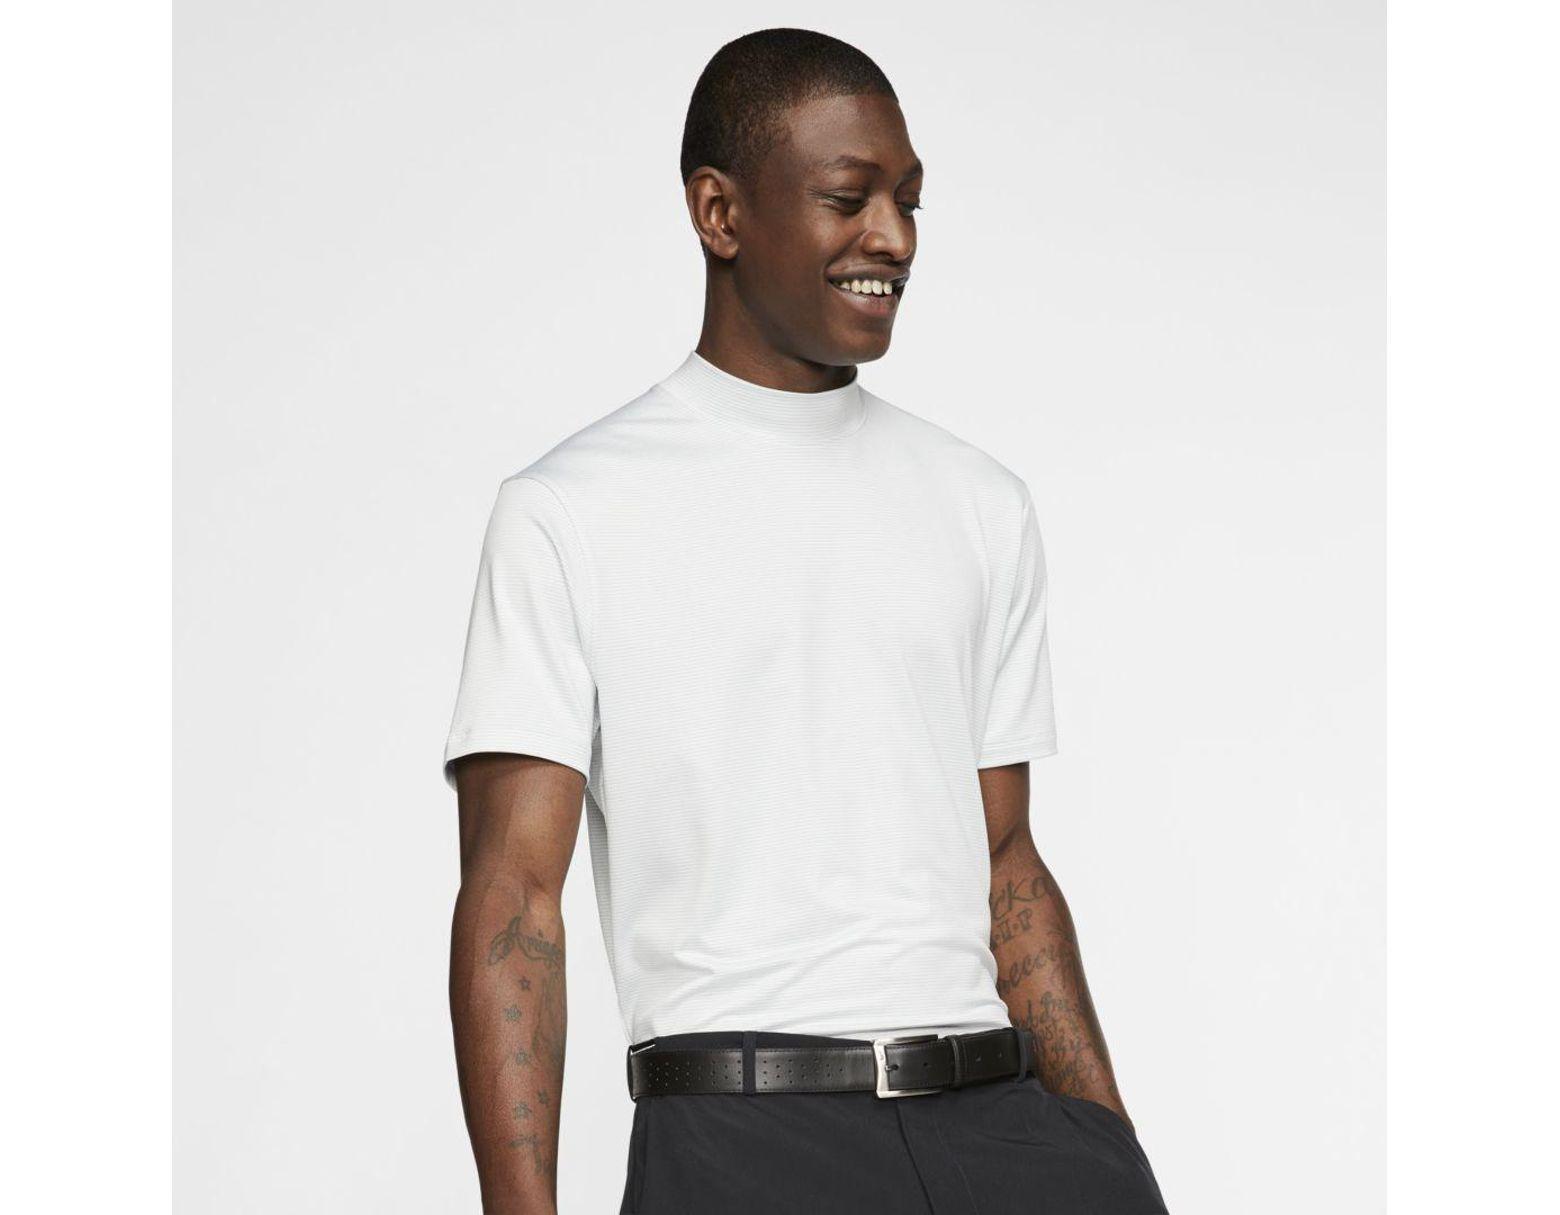 b05d7b28 Nike Dri-fit Tiger Woods Vapor Mock-neck Golf Top in White for Men ...